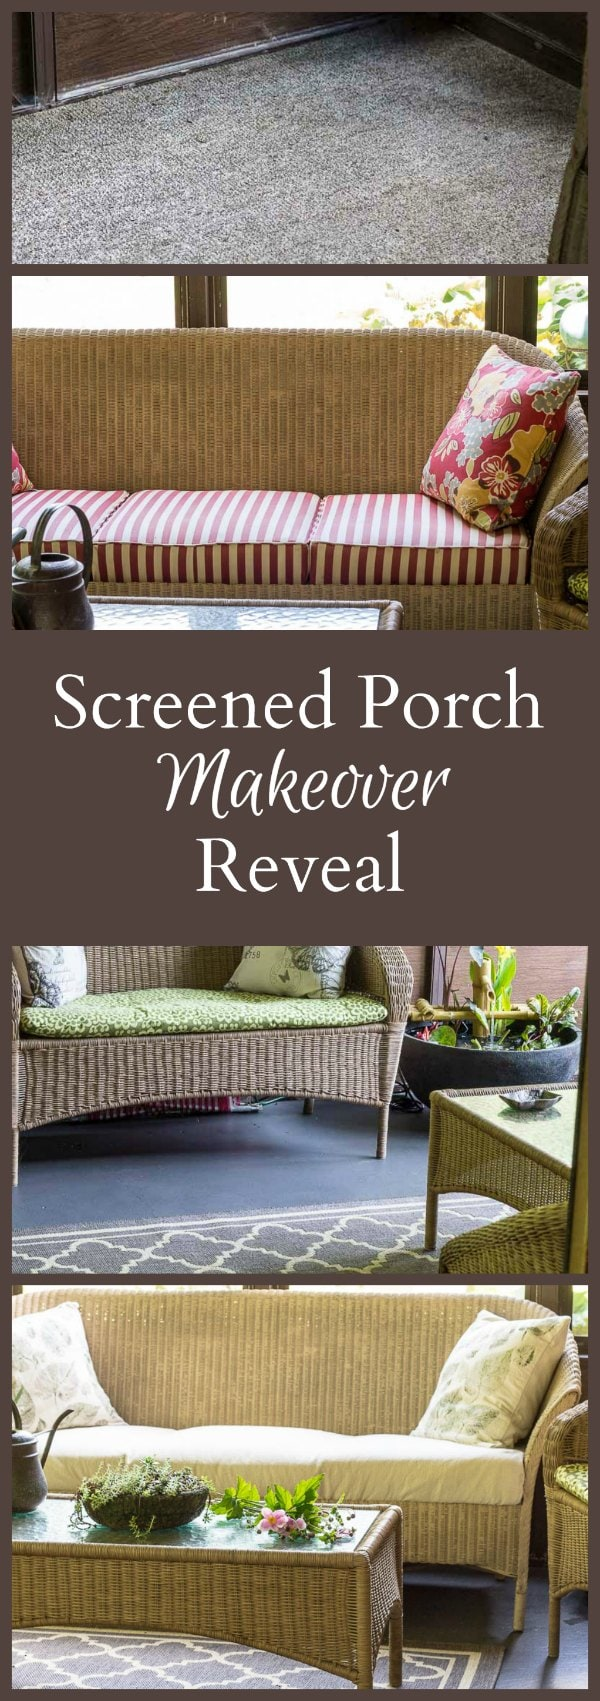 Screened Porch Makeover Reveal